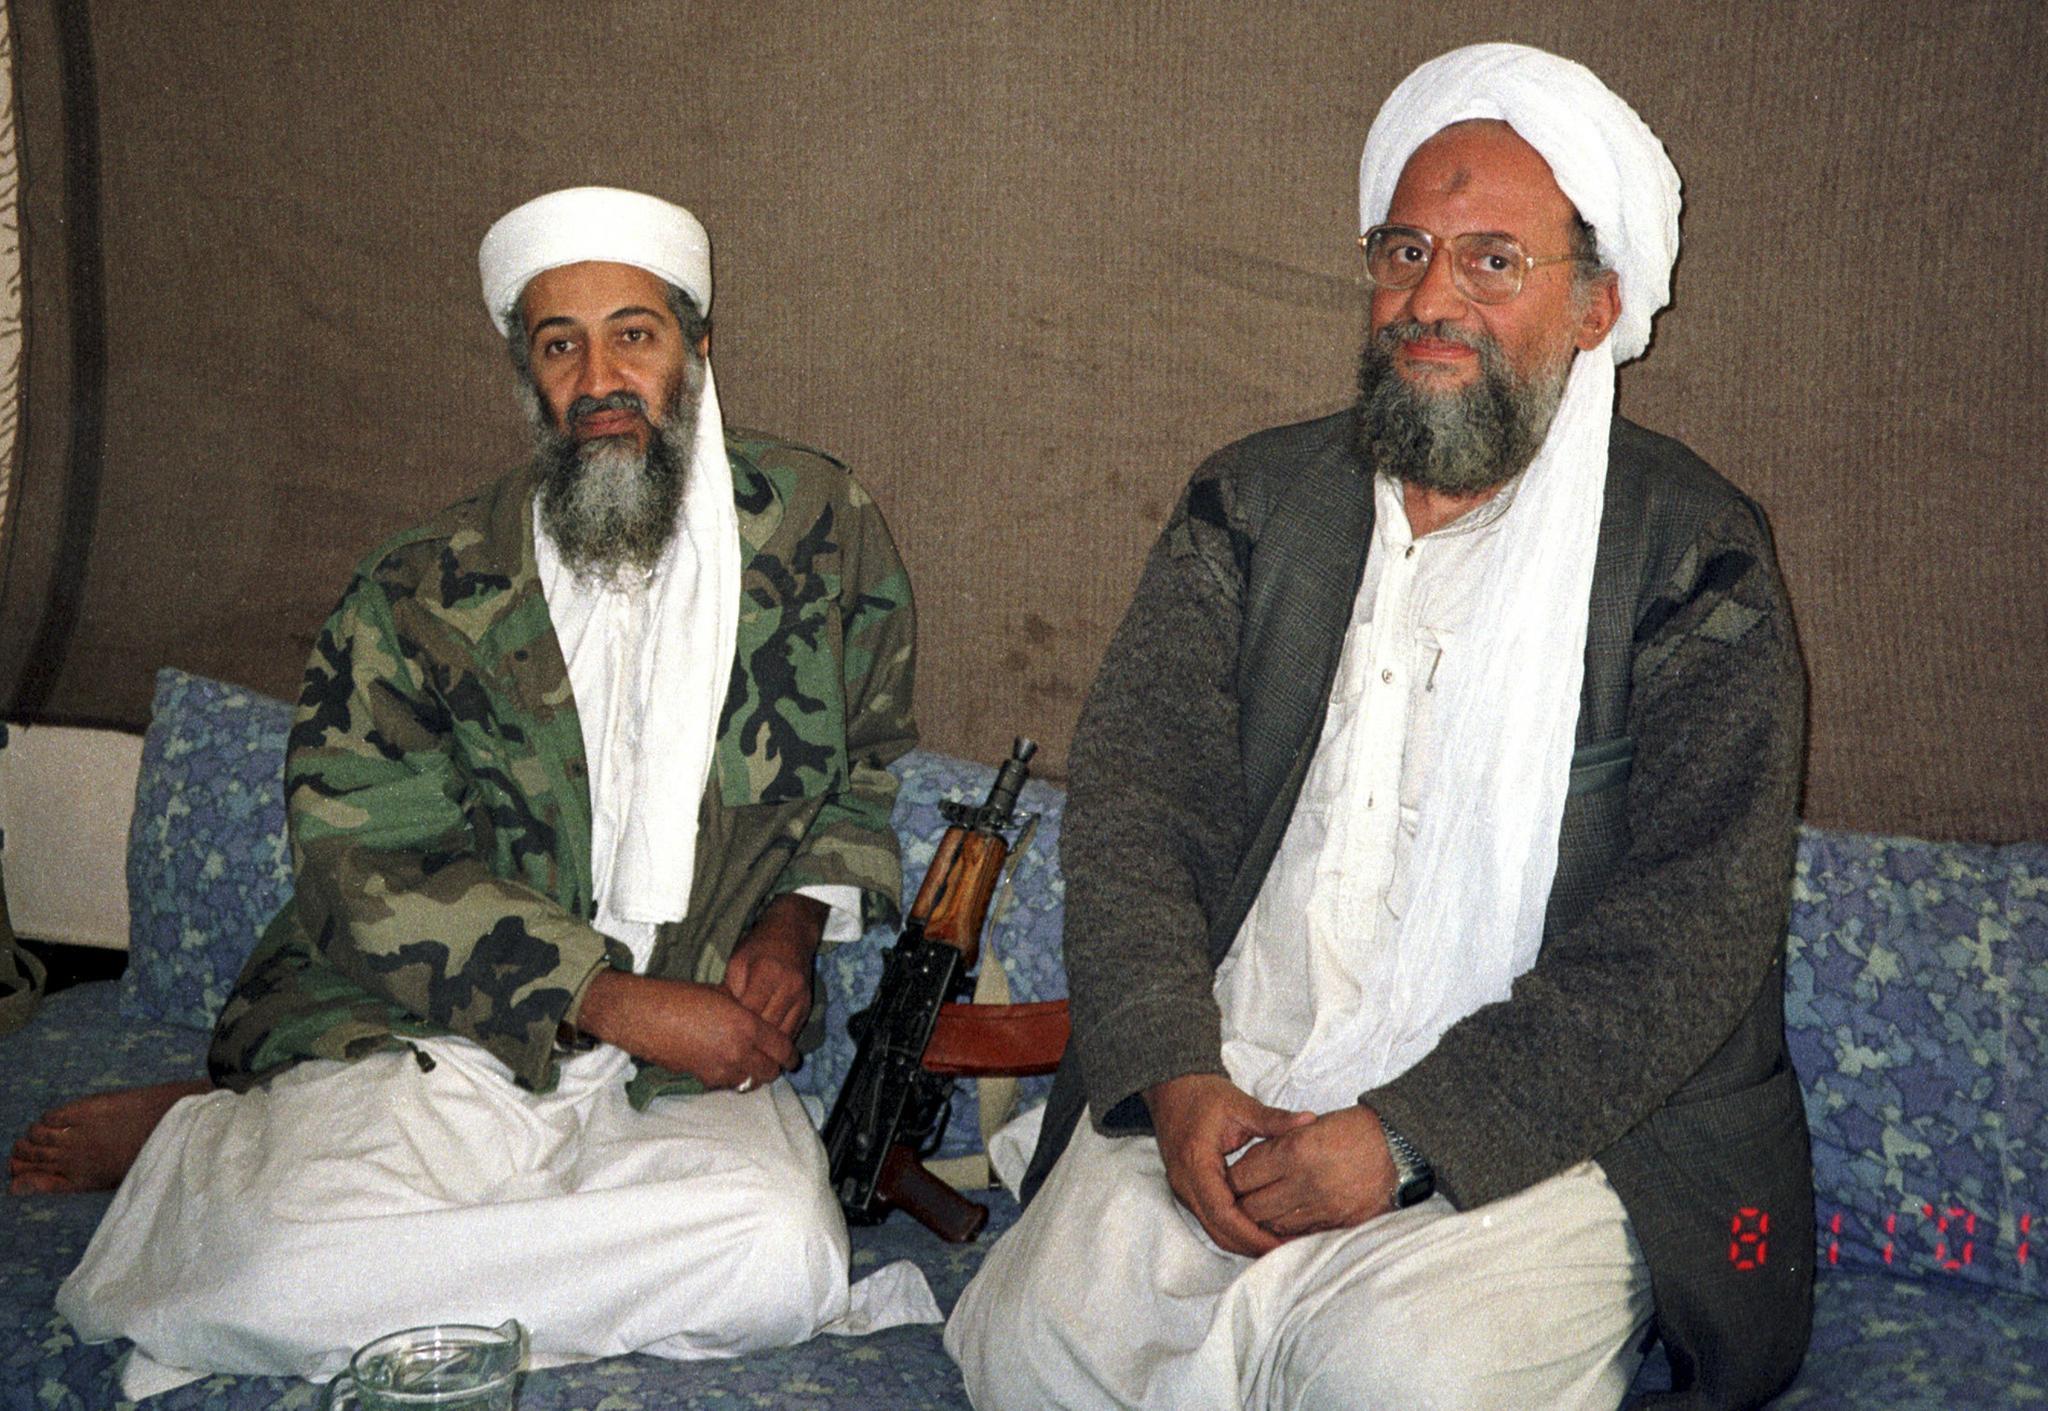 Osama bin Laden, left, sits with his adviser and successor Ayman al-Zawahri, on November 10, 2001. Zawahiri, an Egyptian, is now the head of Al-Qaeda.